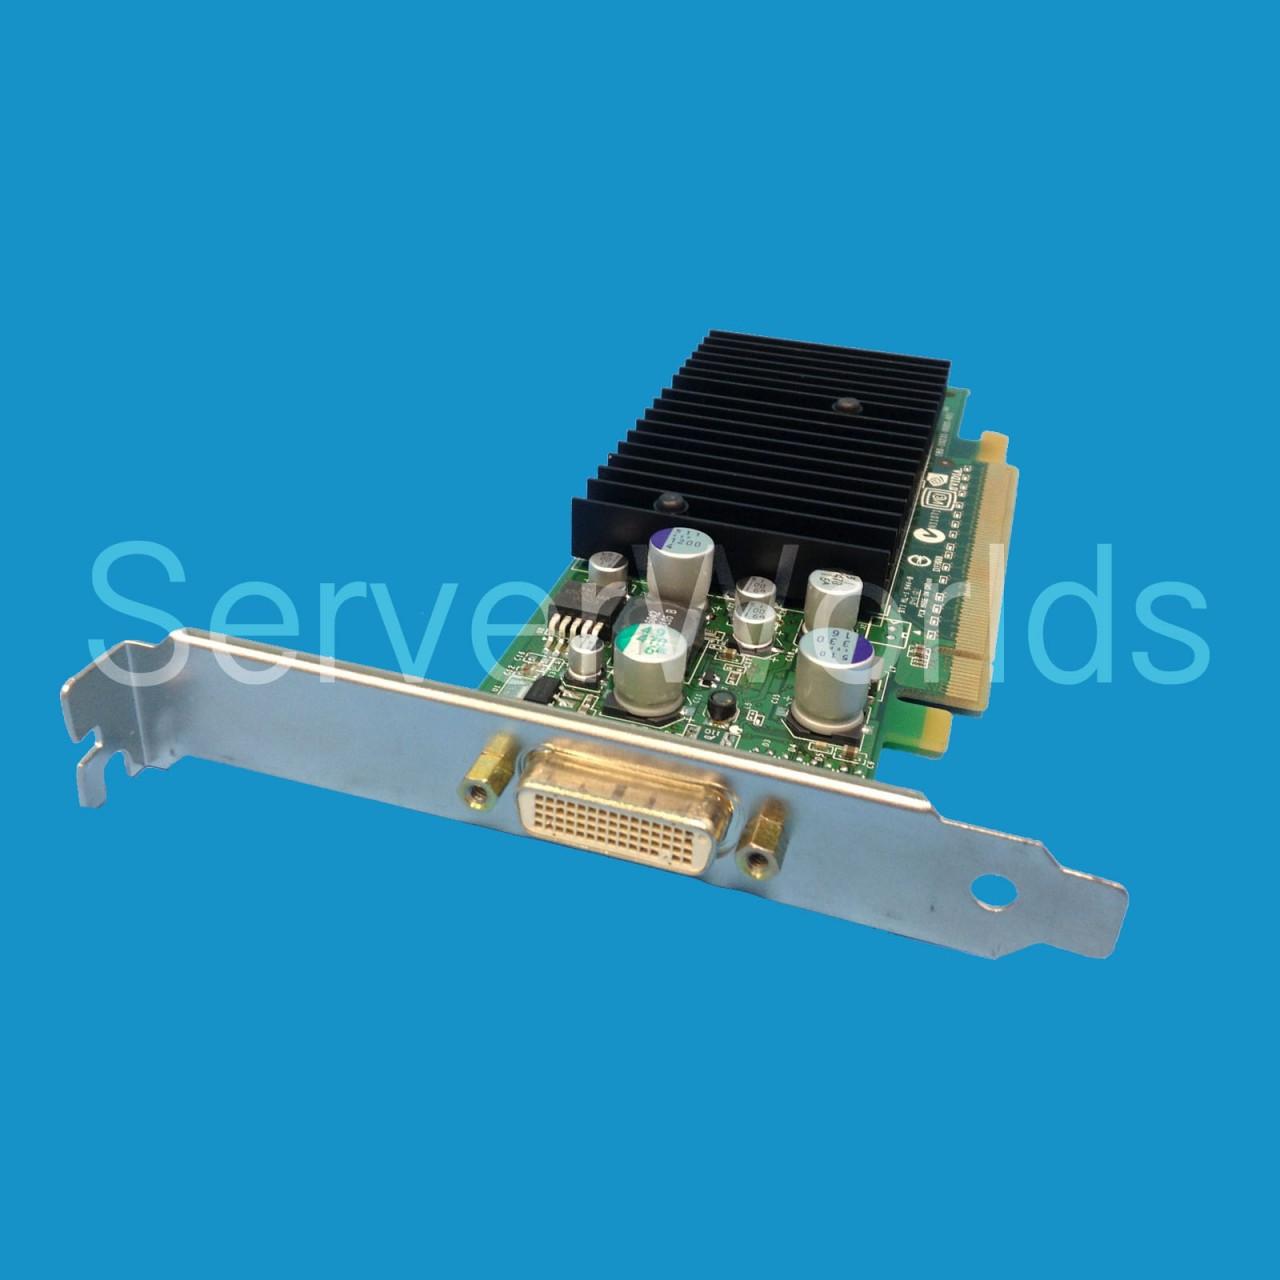 Dell N4079 | NVIDIA Quadro NVS280 Graphics Card - Serverworlds